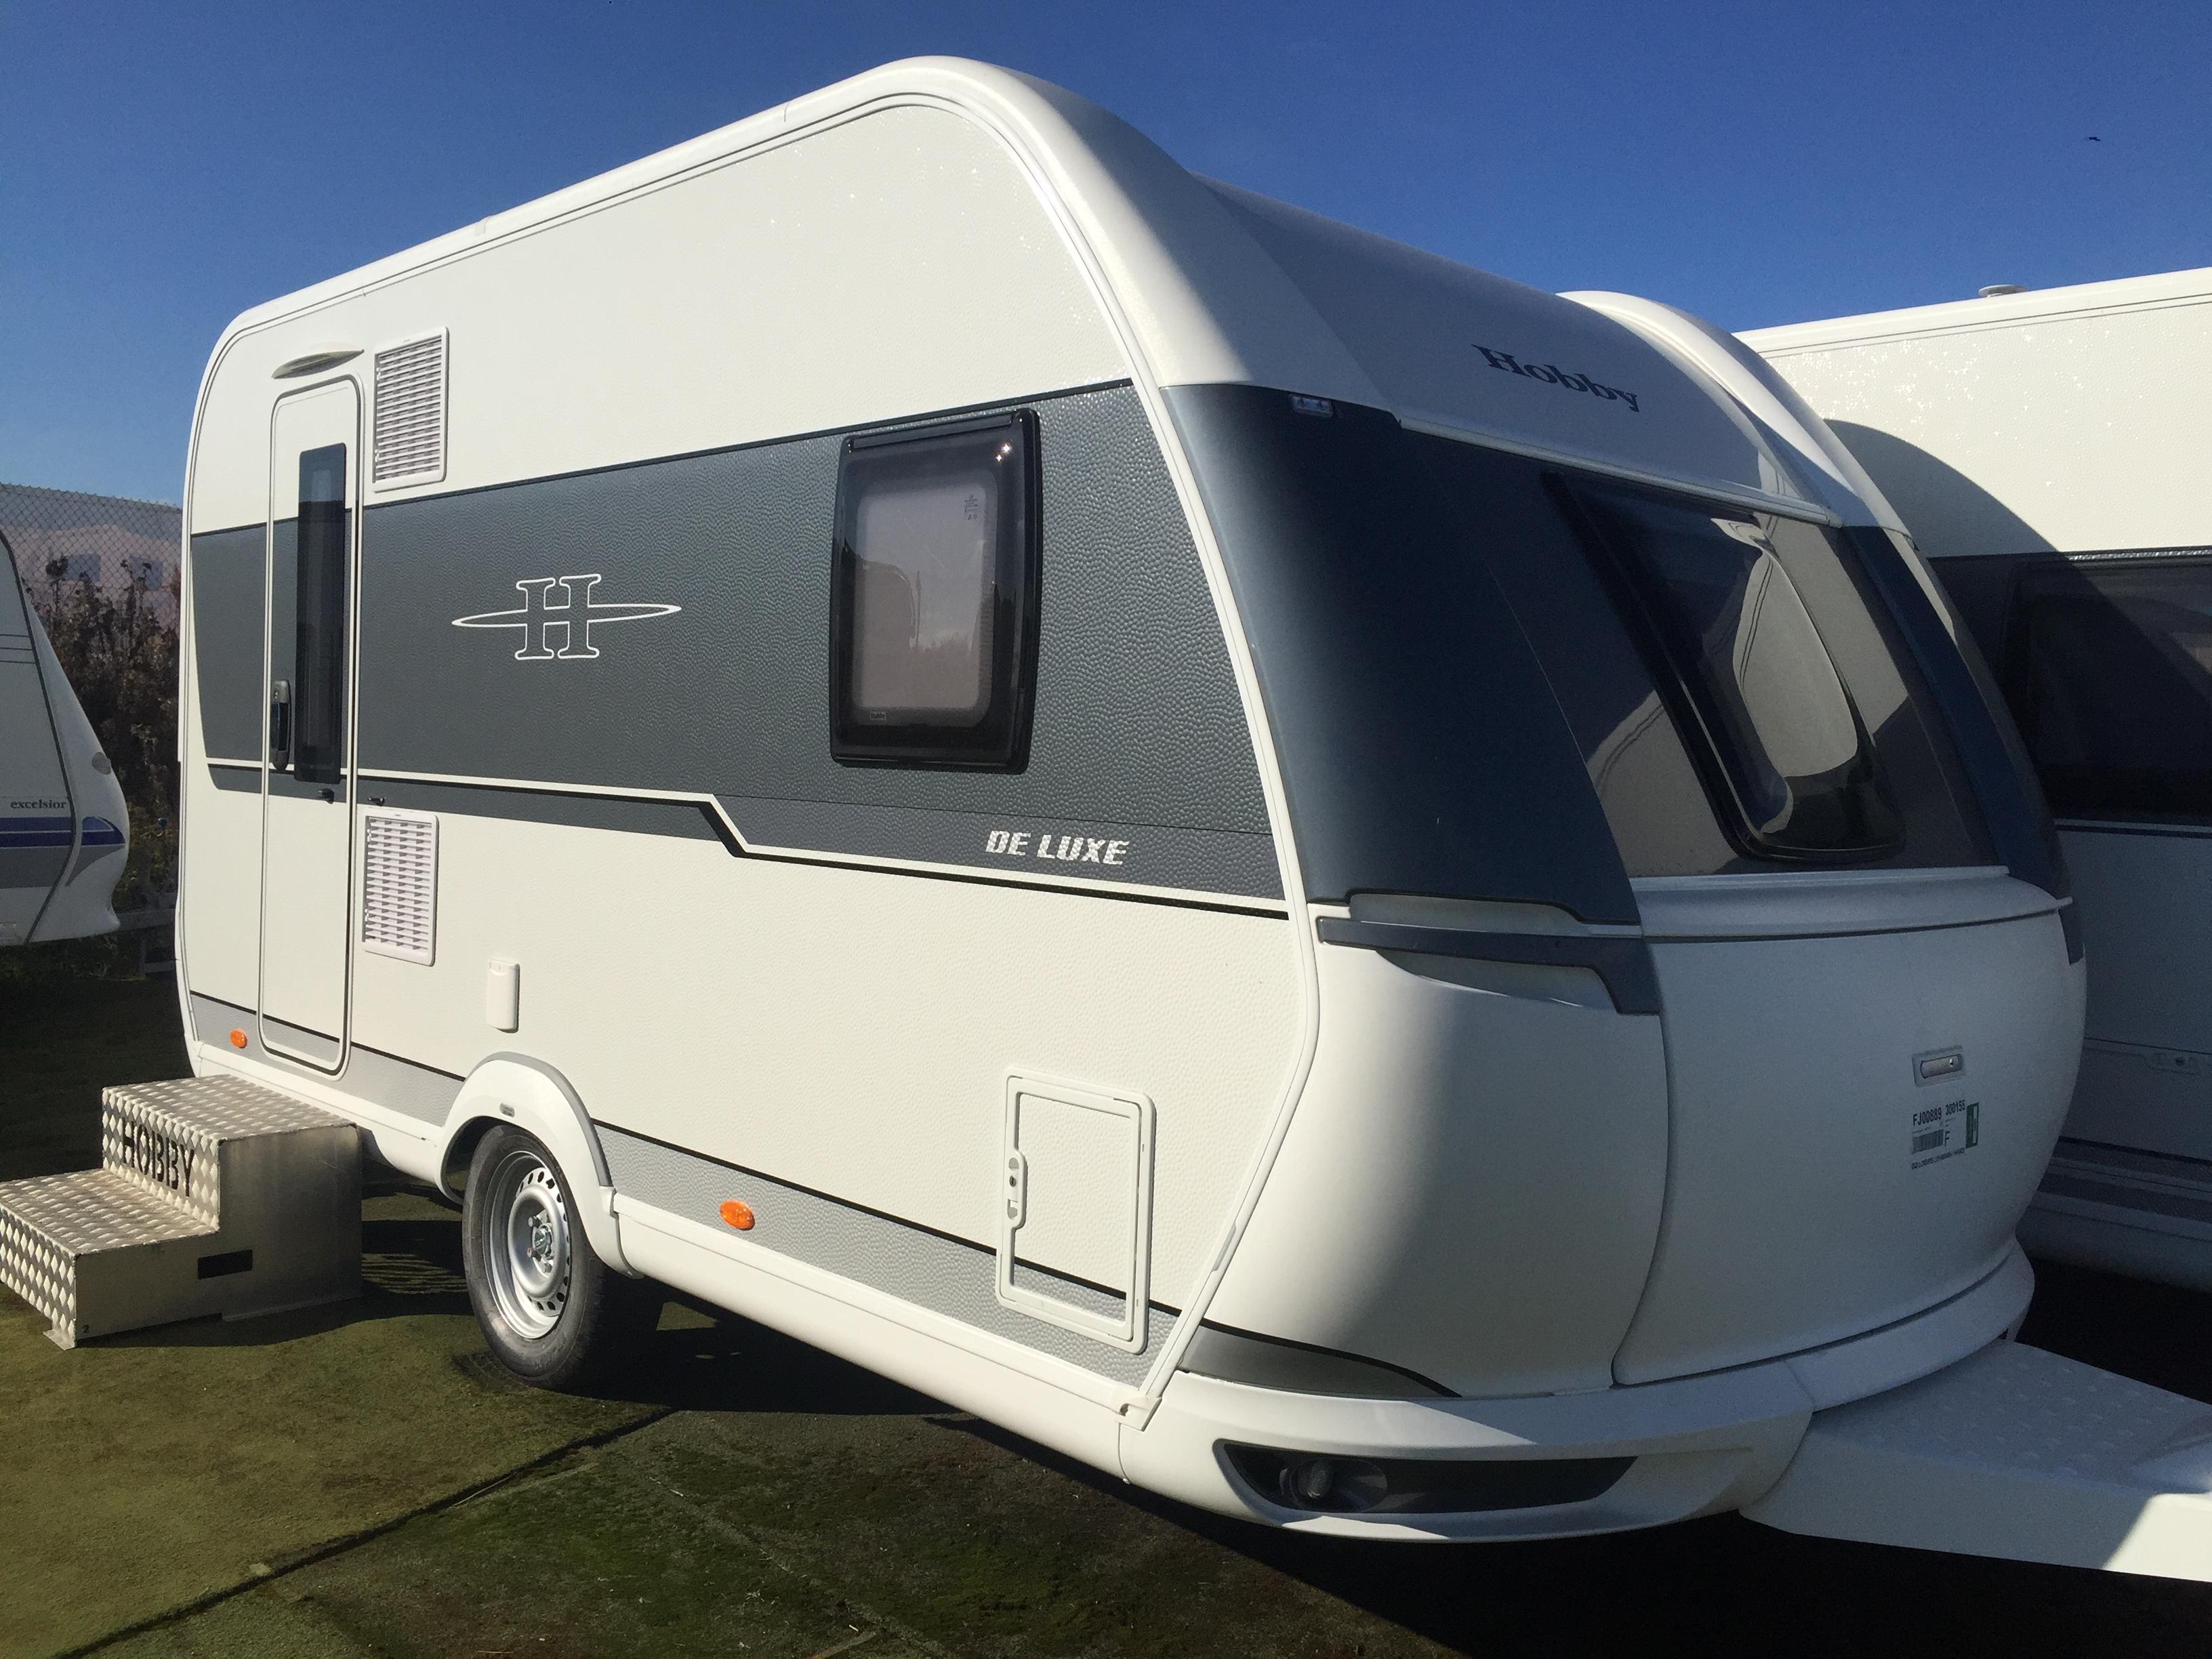 hobby 400 sfe de luxe neuf de 2018 caravane en vente oberschaeffolsheim rhin 67. Black Bedroom Furniture Sets. Home Design Ideas